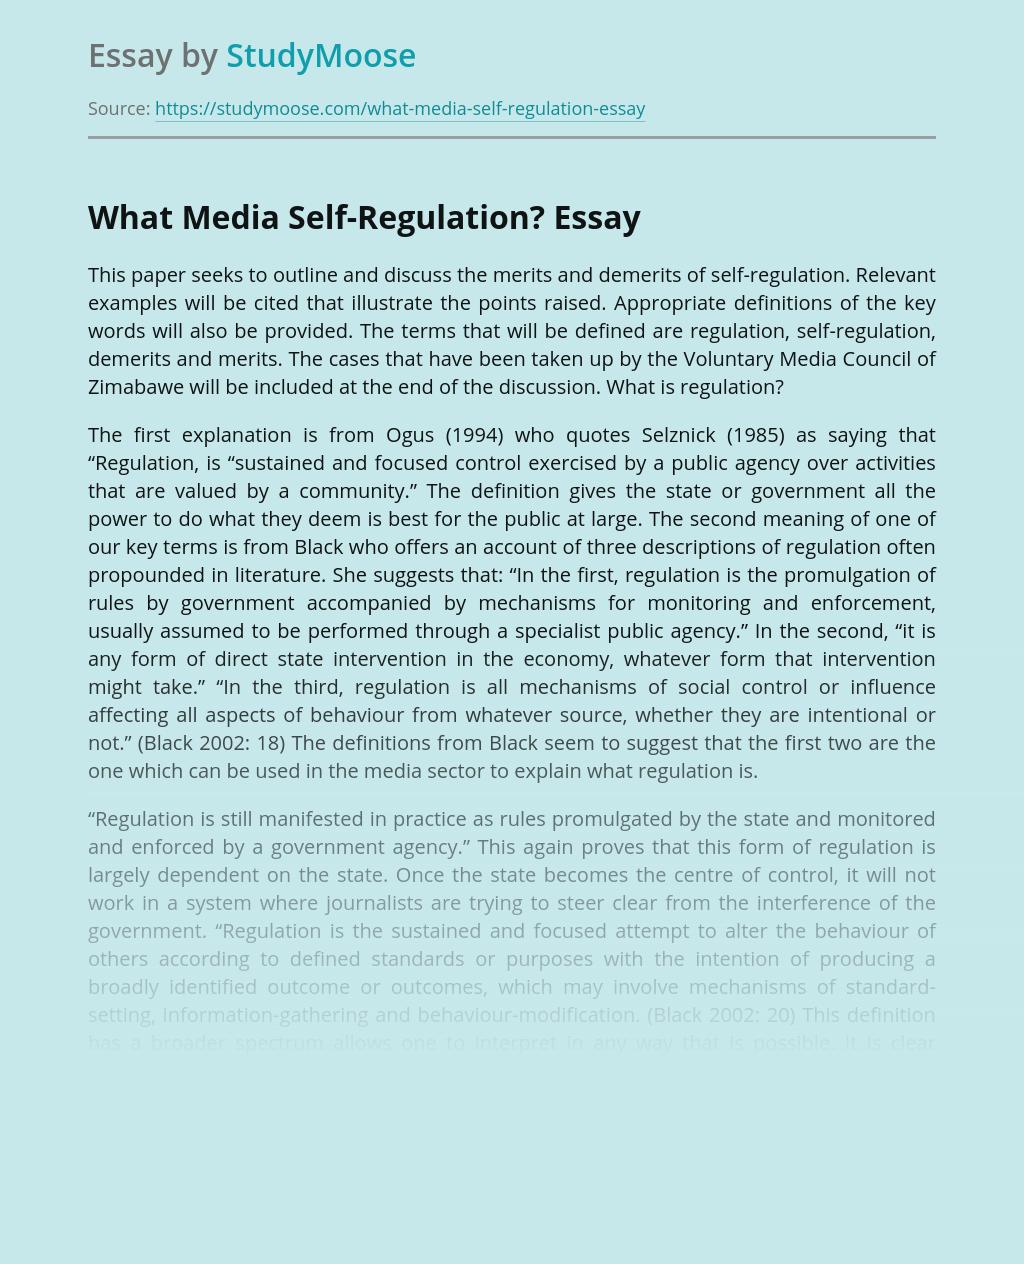 What Media Self-Regulation?